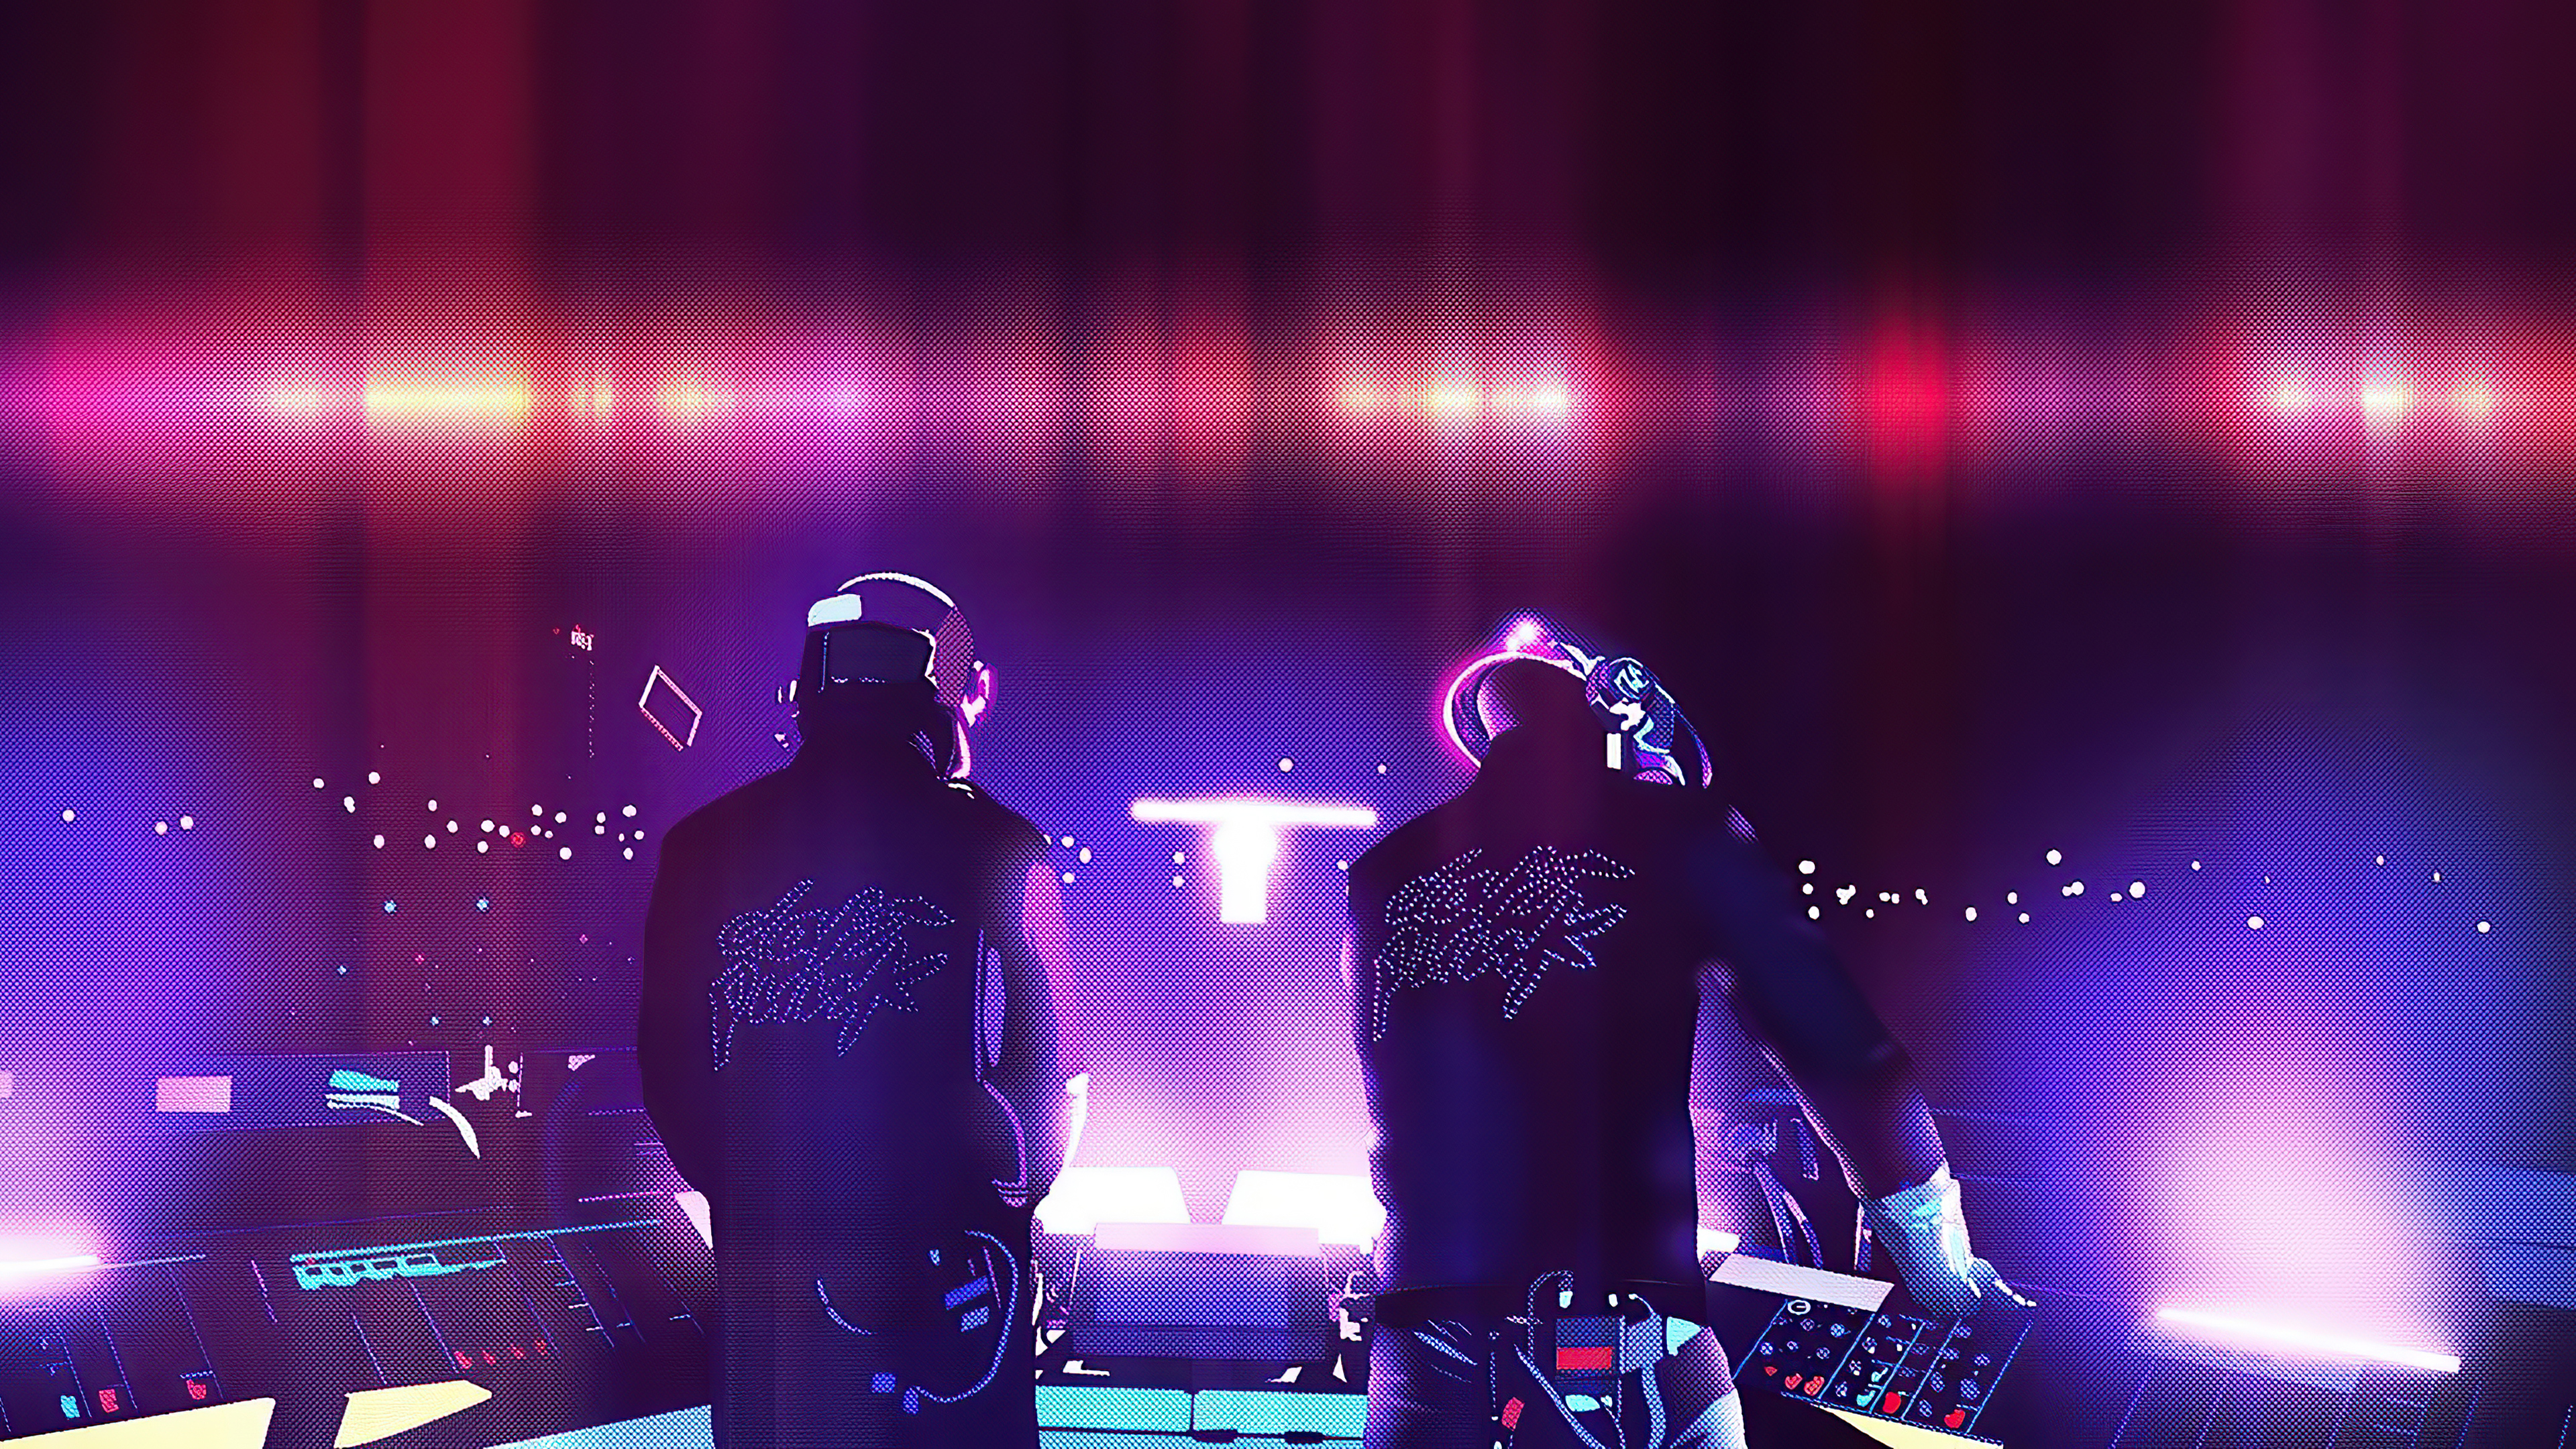 daft punk dj 4k 1608984468 - Daft Punk Dj 4k - Daft Punk Dj 4k wallpapers